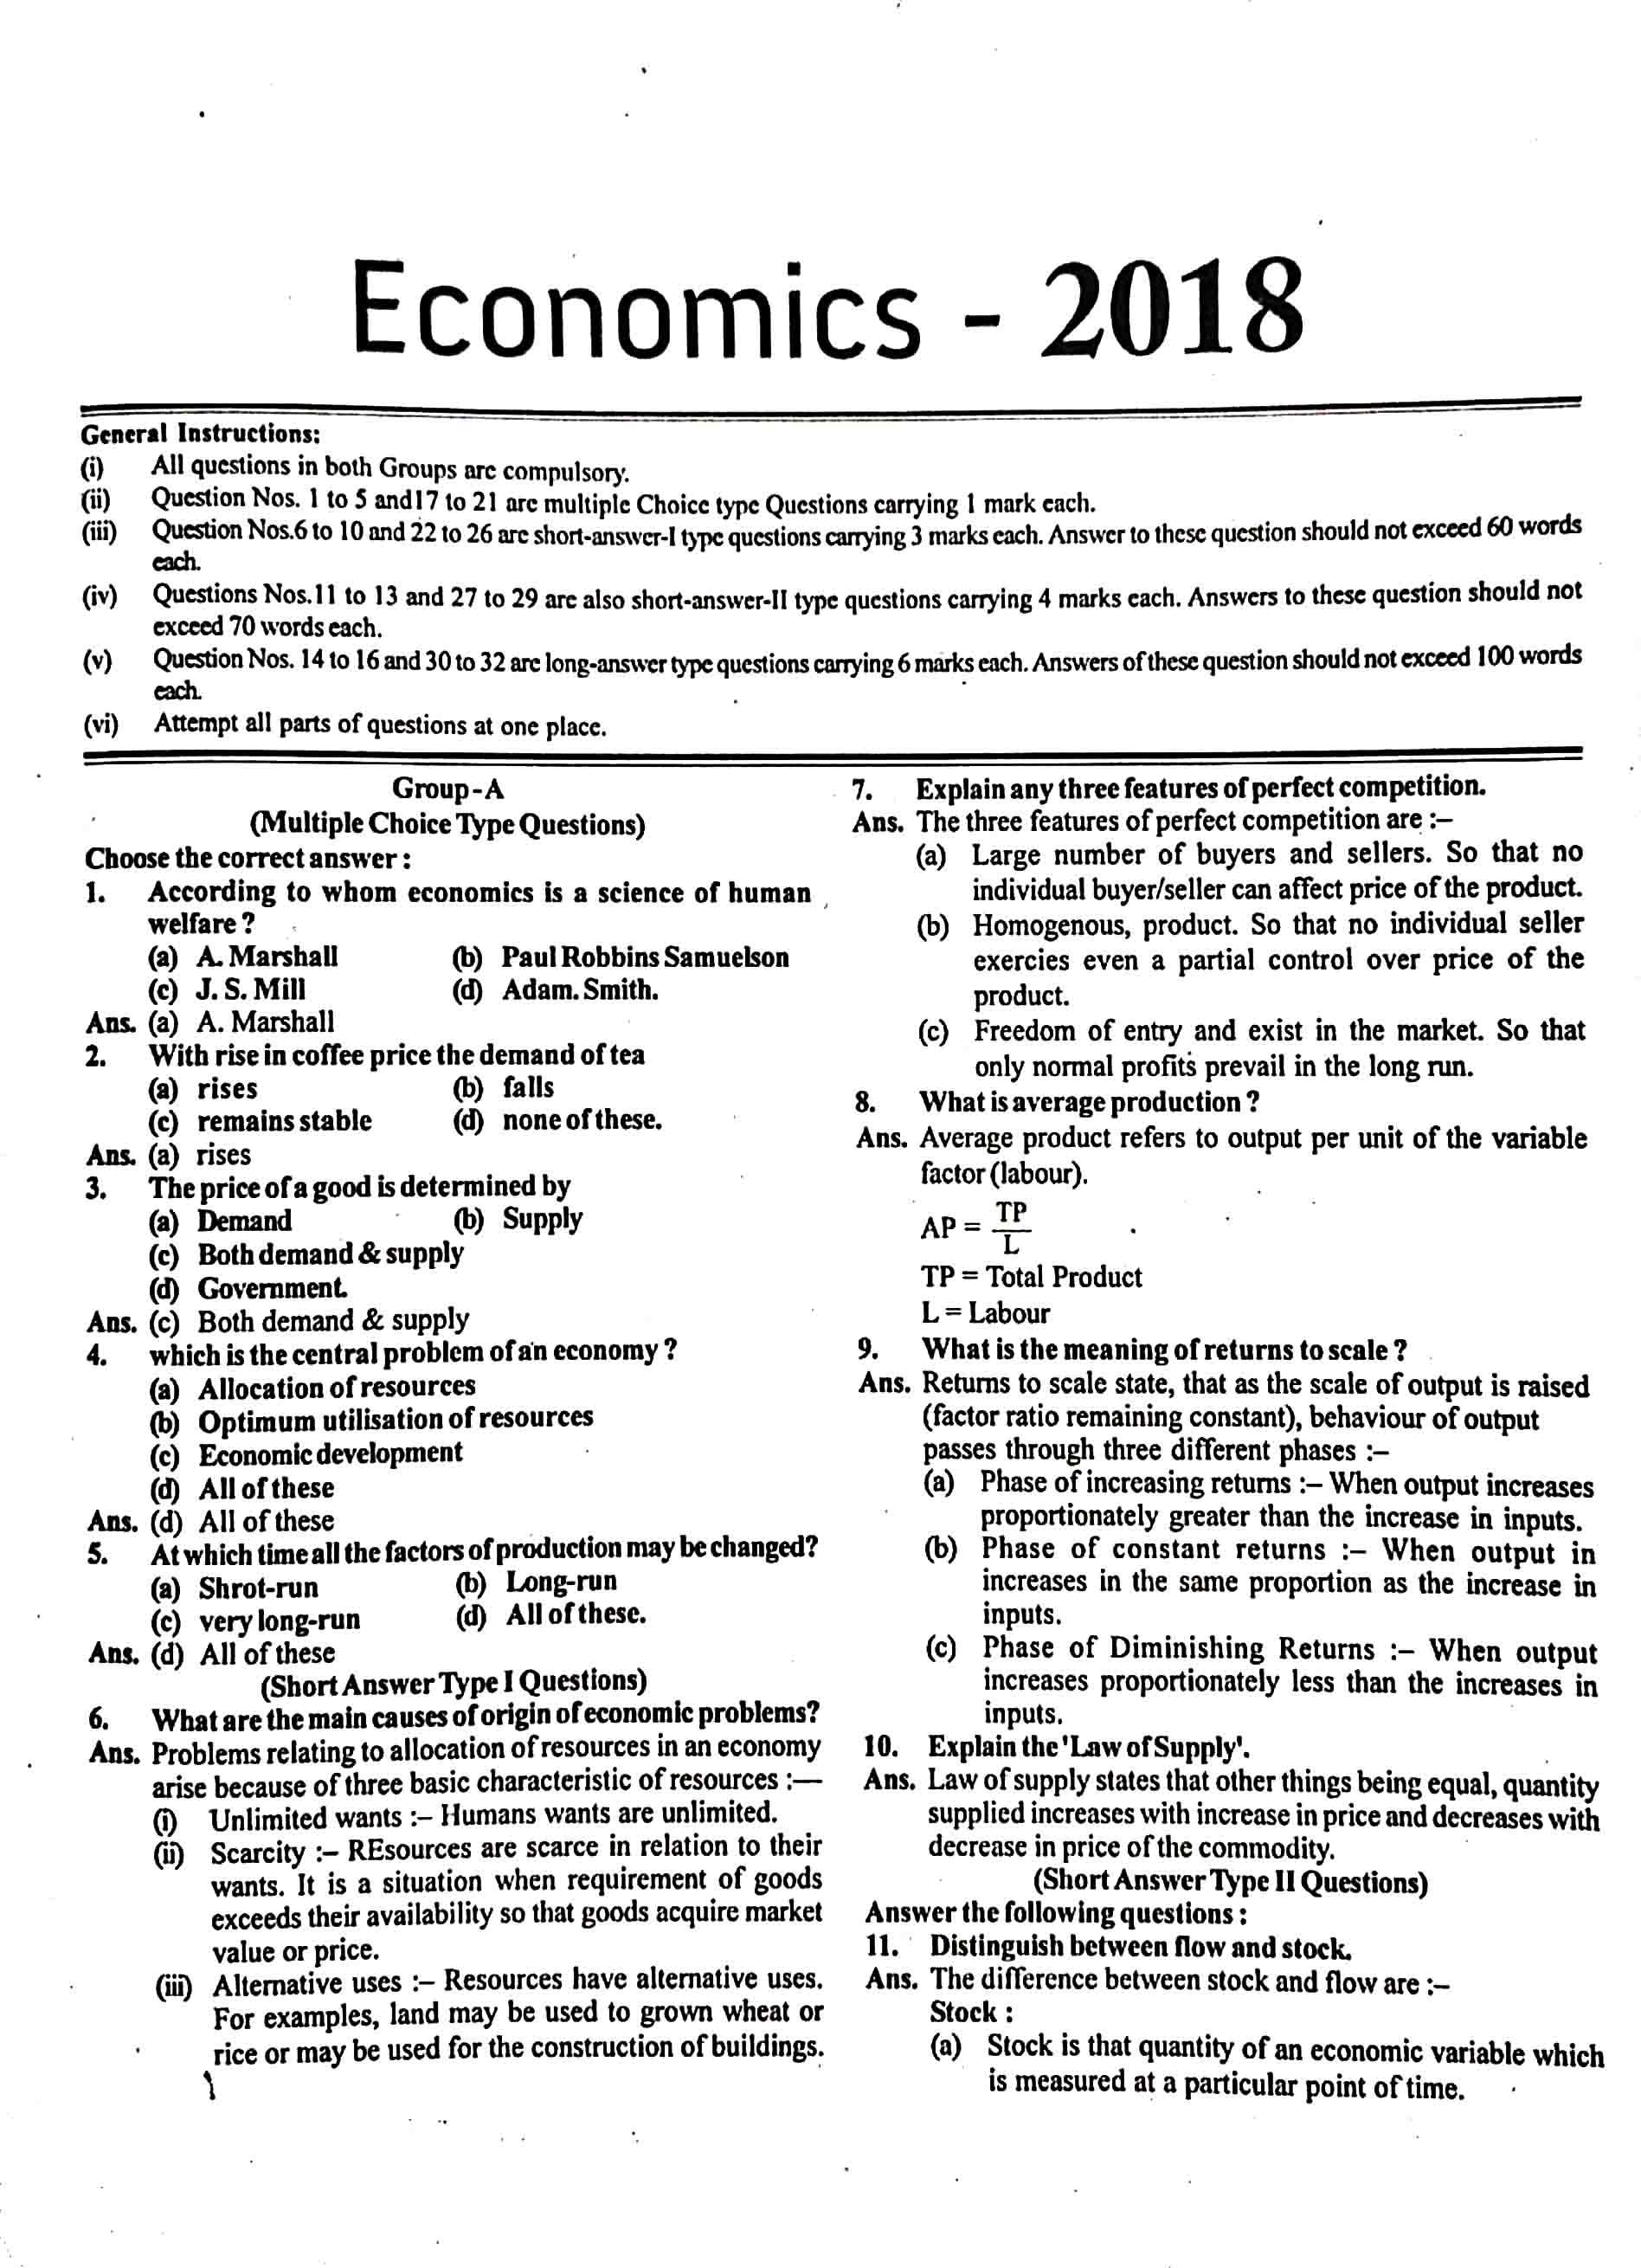 JAC Class 12 economics 2018 Question Paper 01